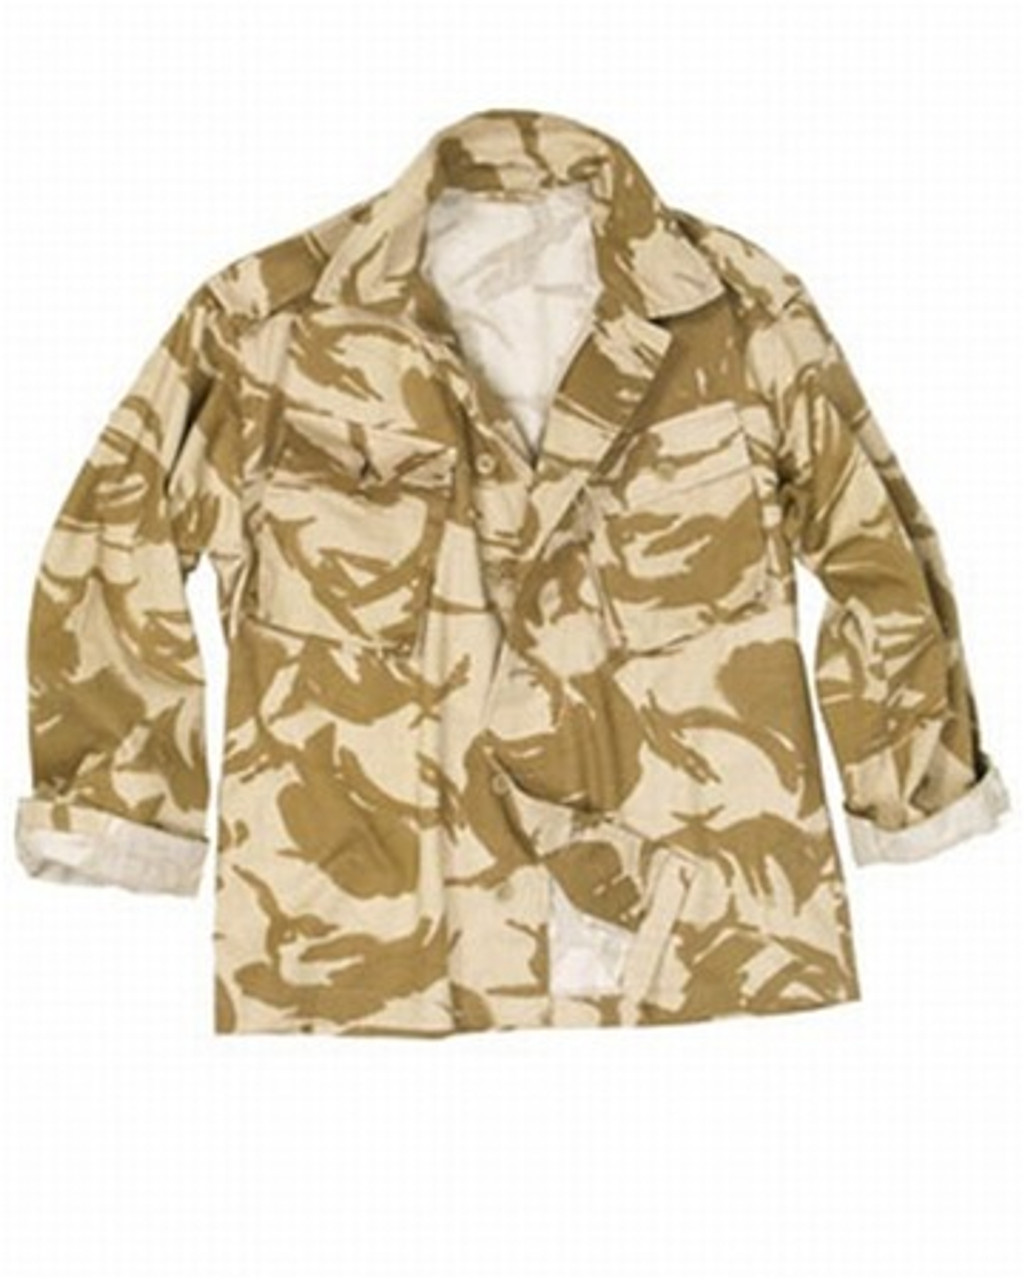 British Desert DPM Camo Field Shirt from Hessen Surplus